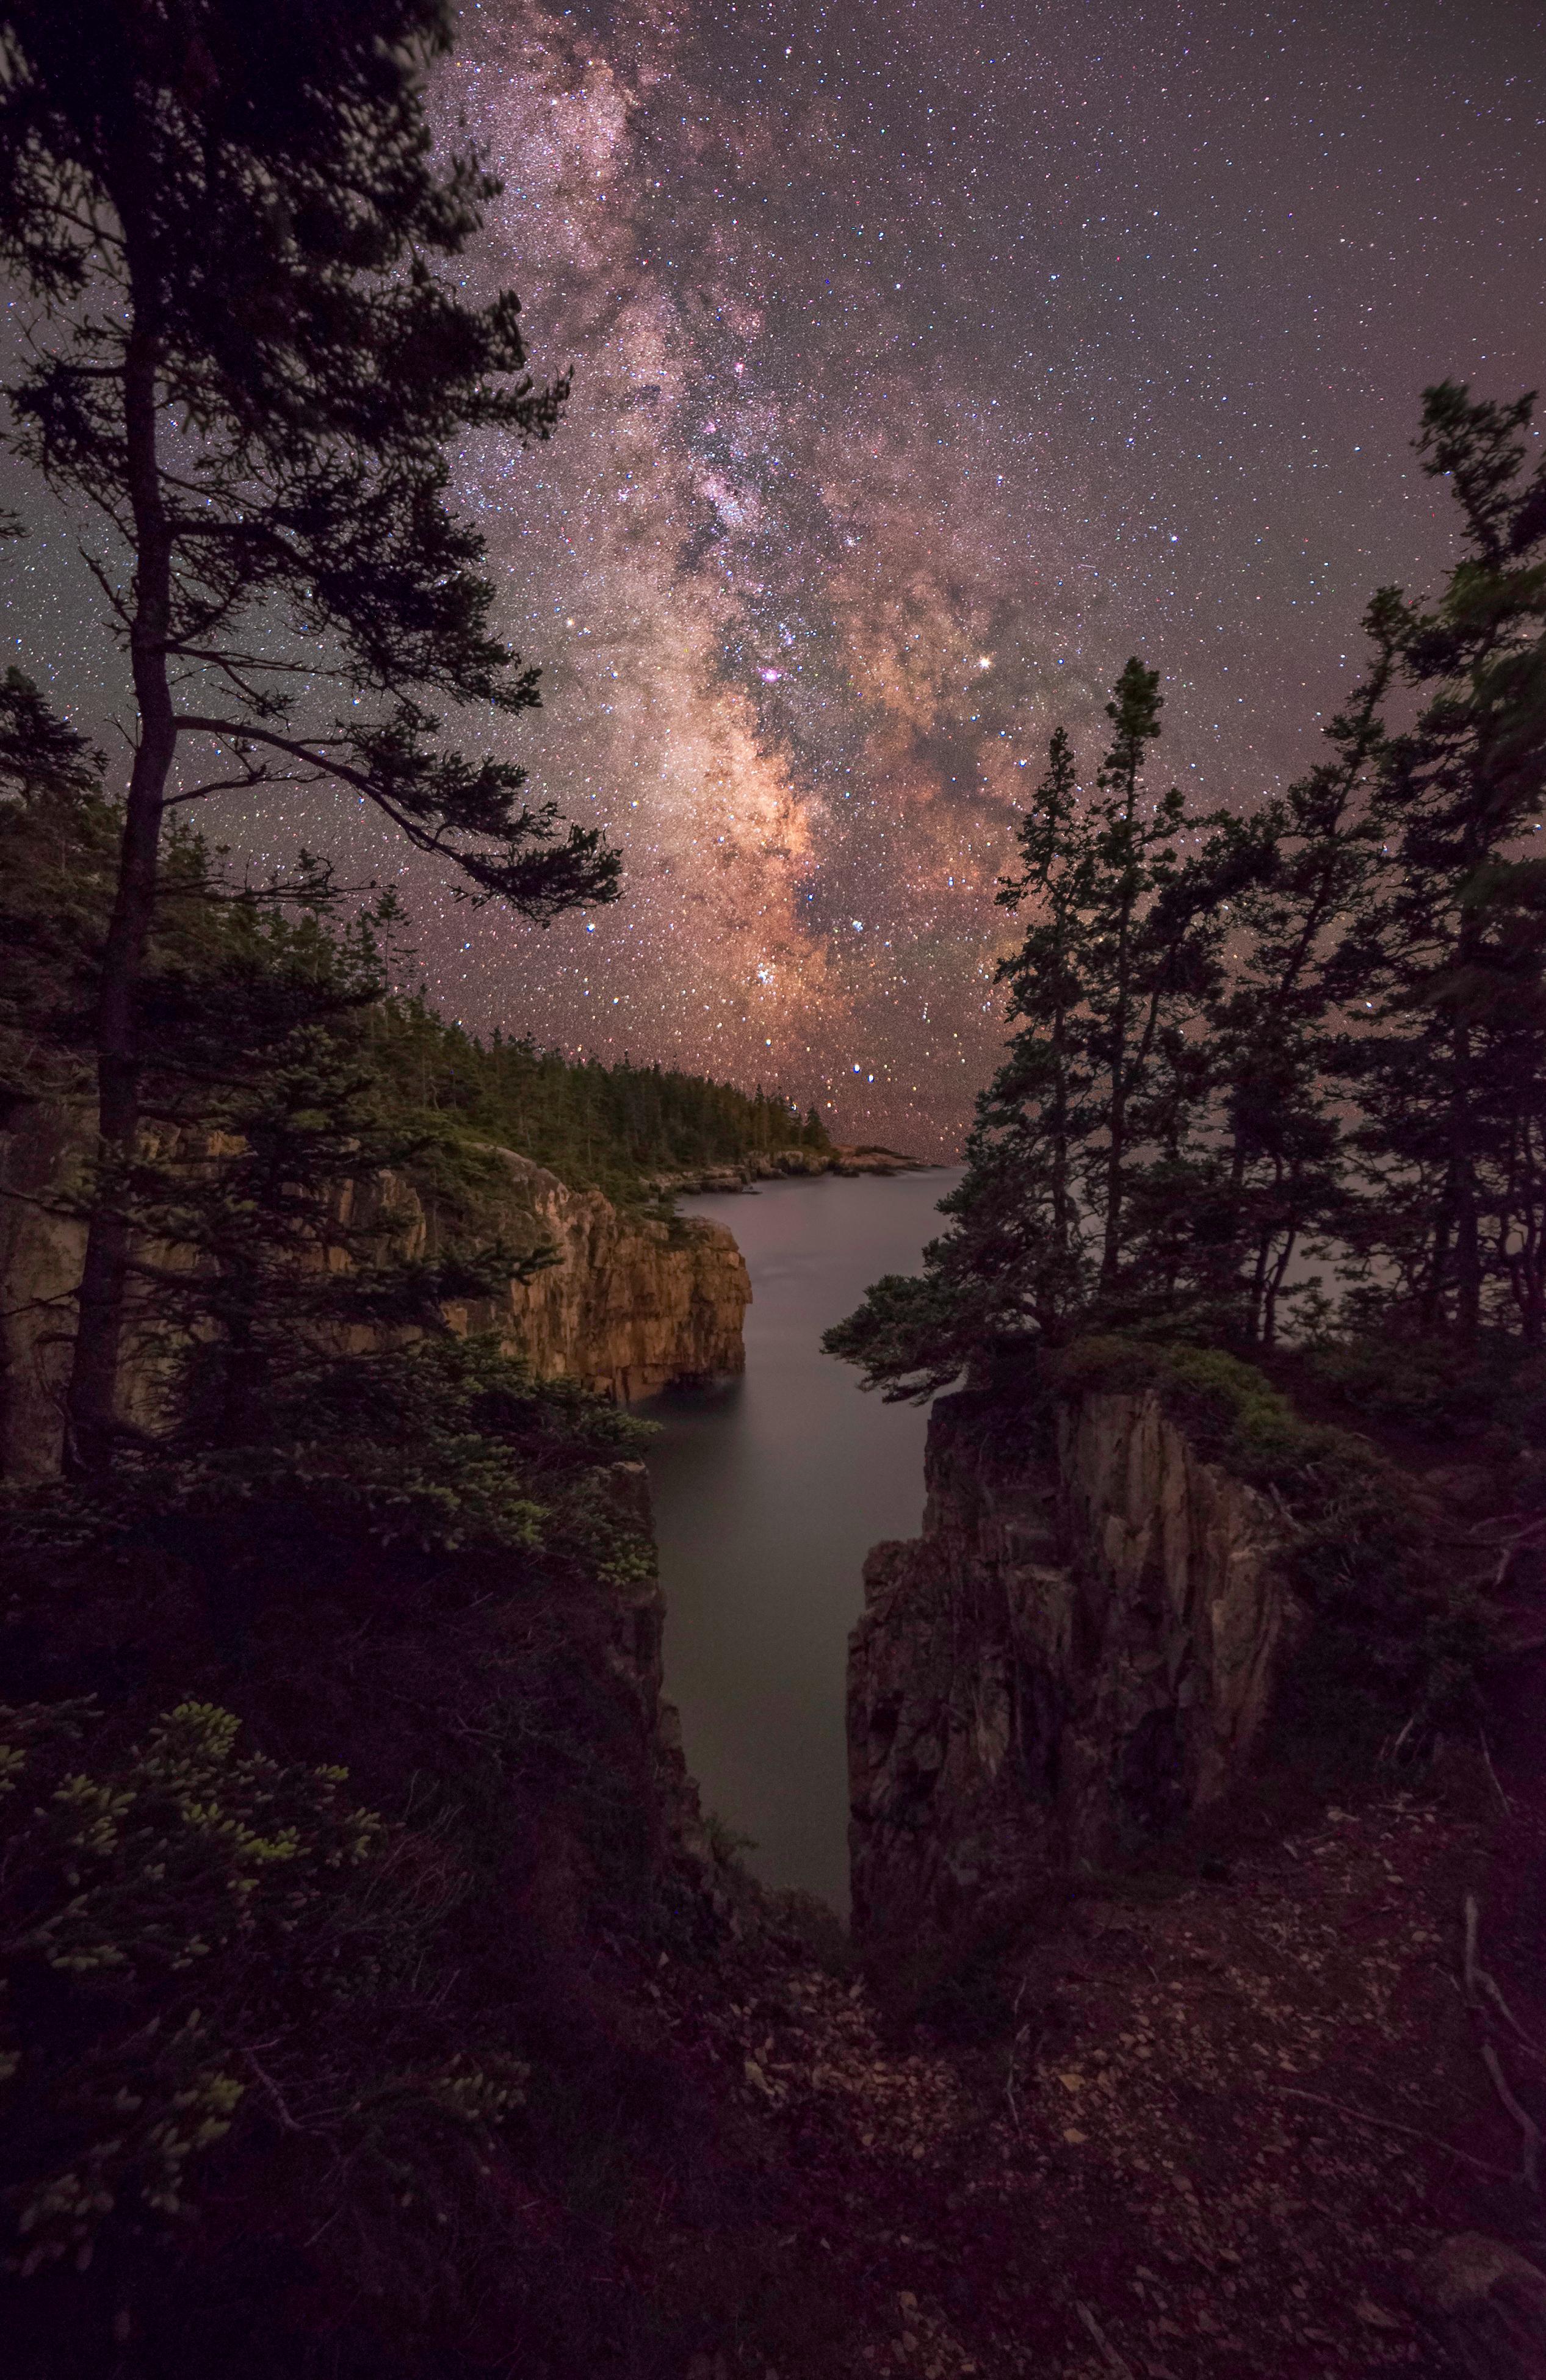 Central Park Iphone 6 Wallpaper Michaelpocketlist Milky Way Rising Over The Atlantic